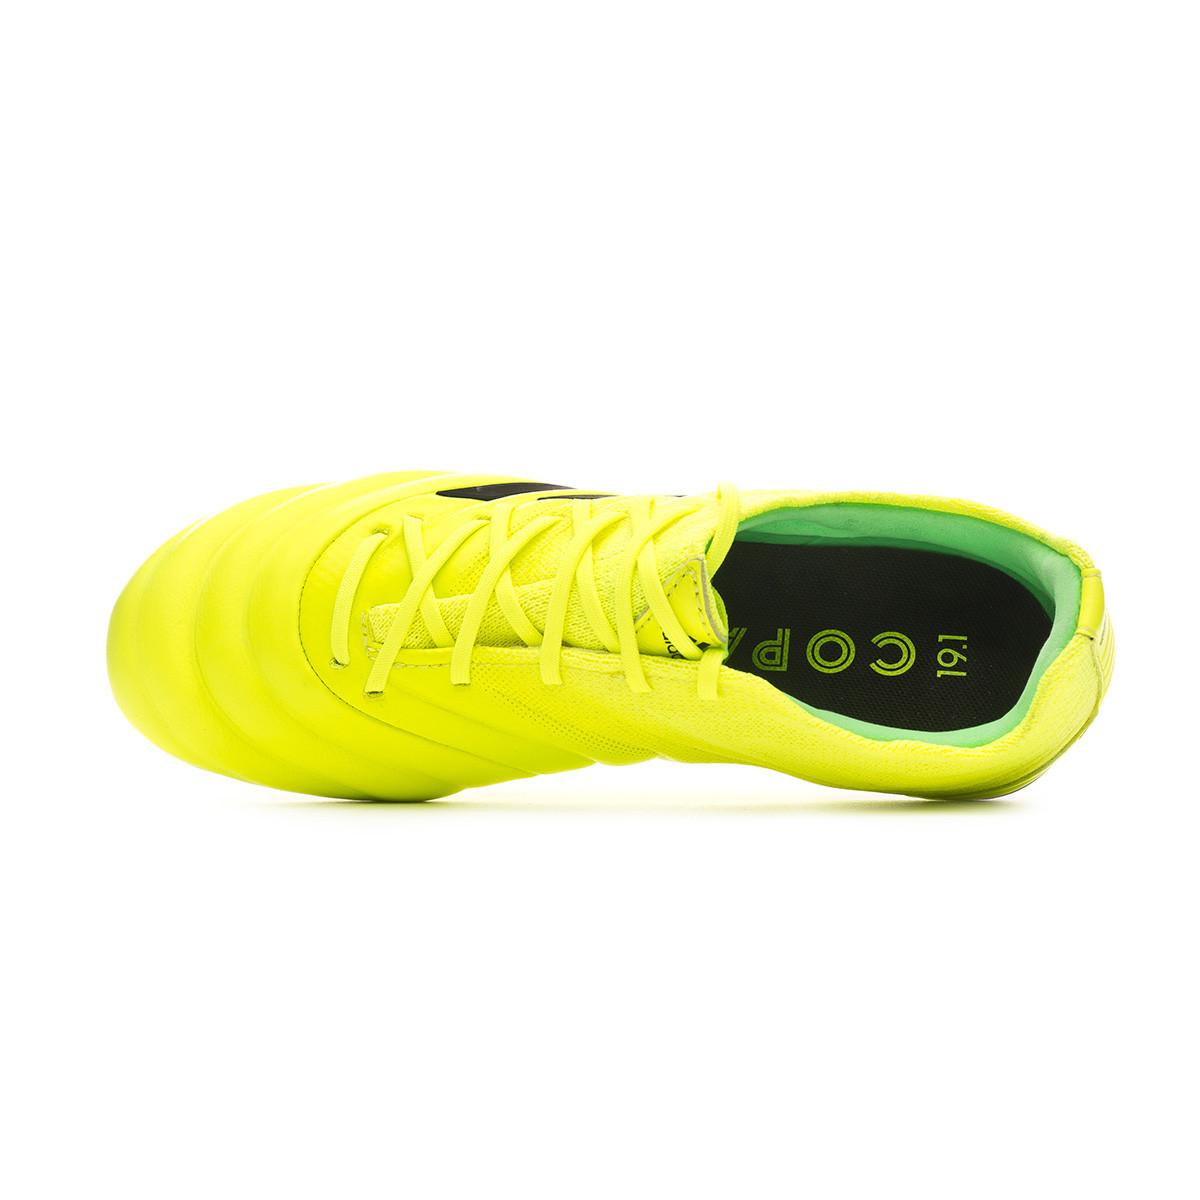 Chaussure de foot adidas Copa 19.1 FG Niño